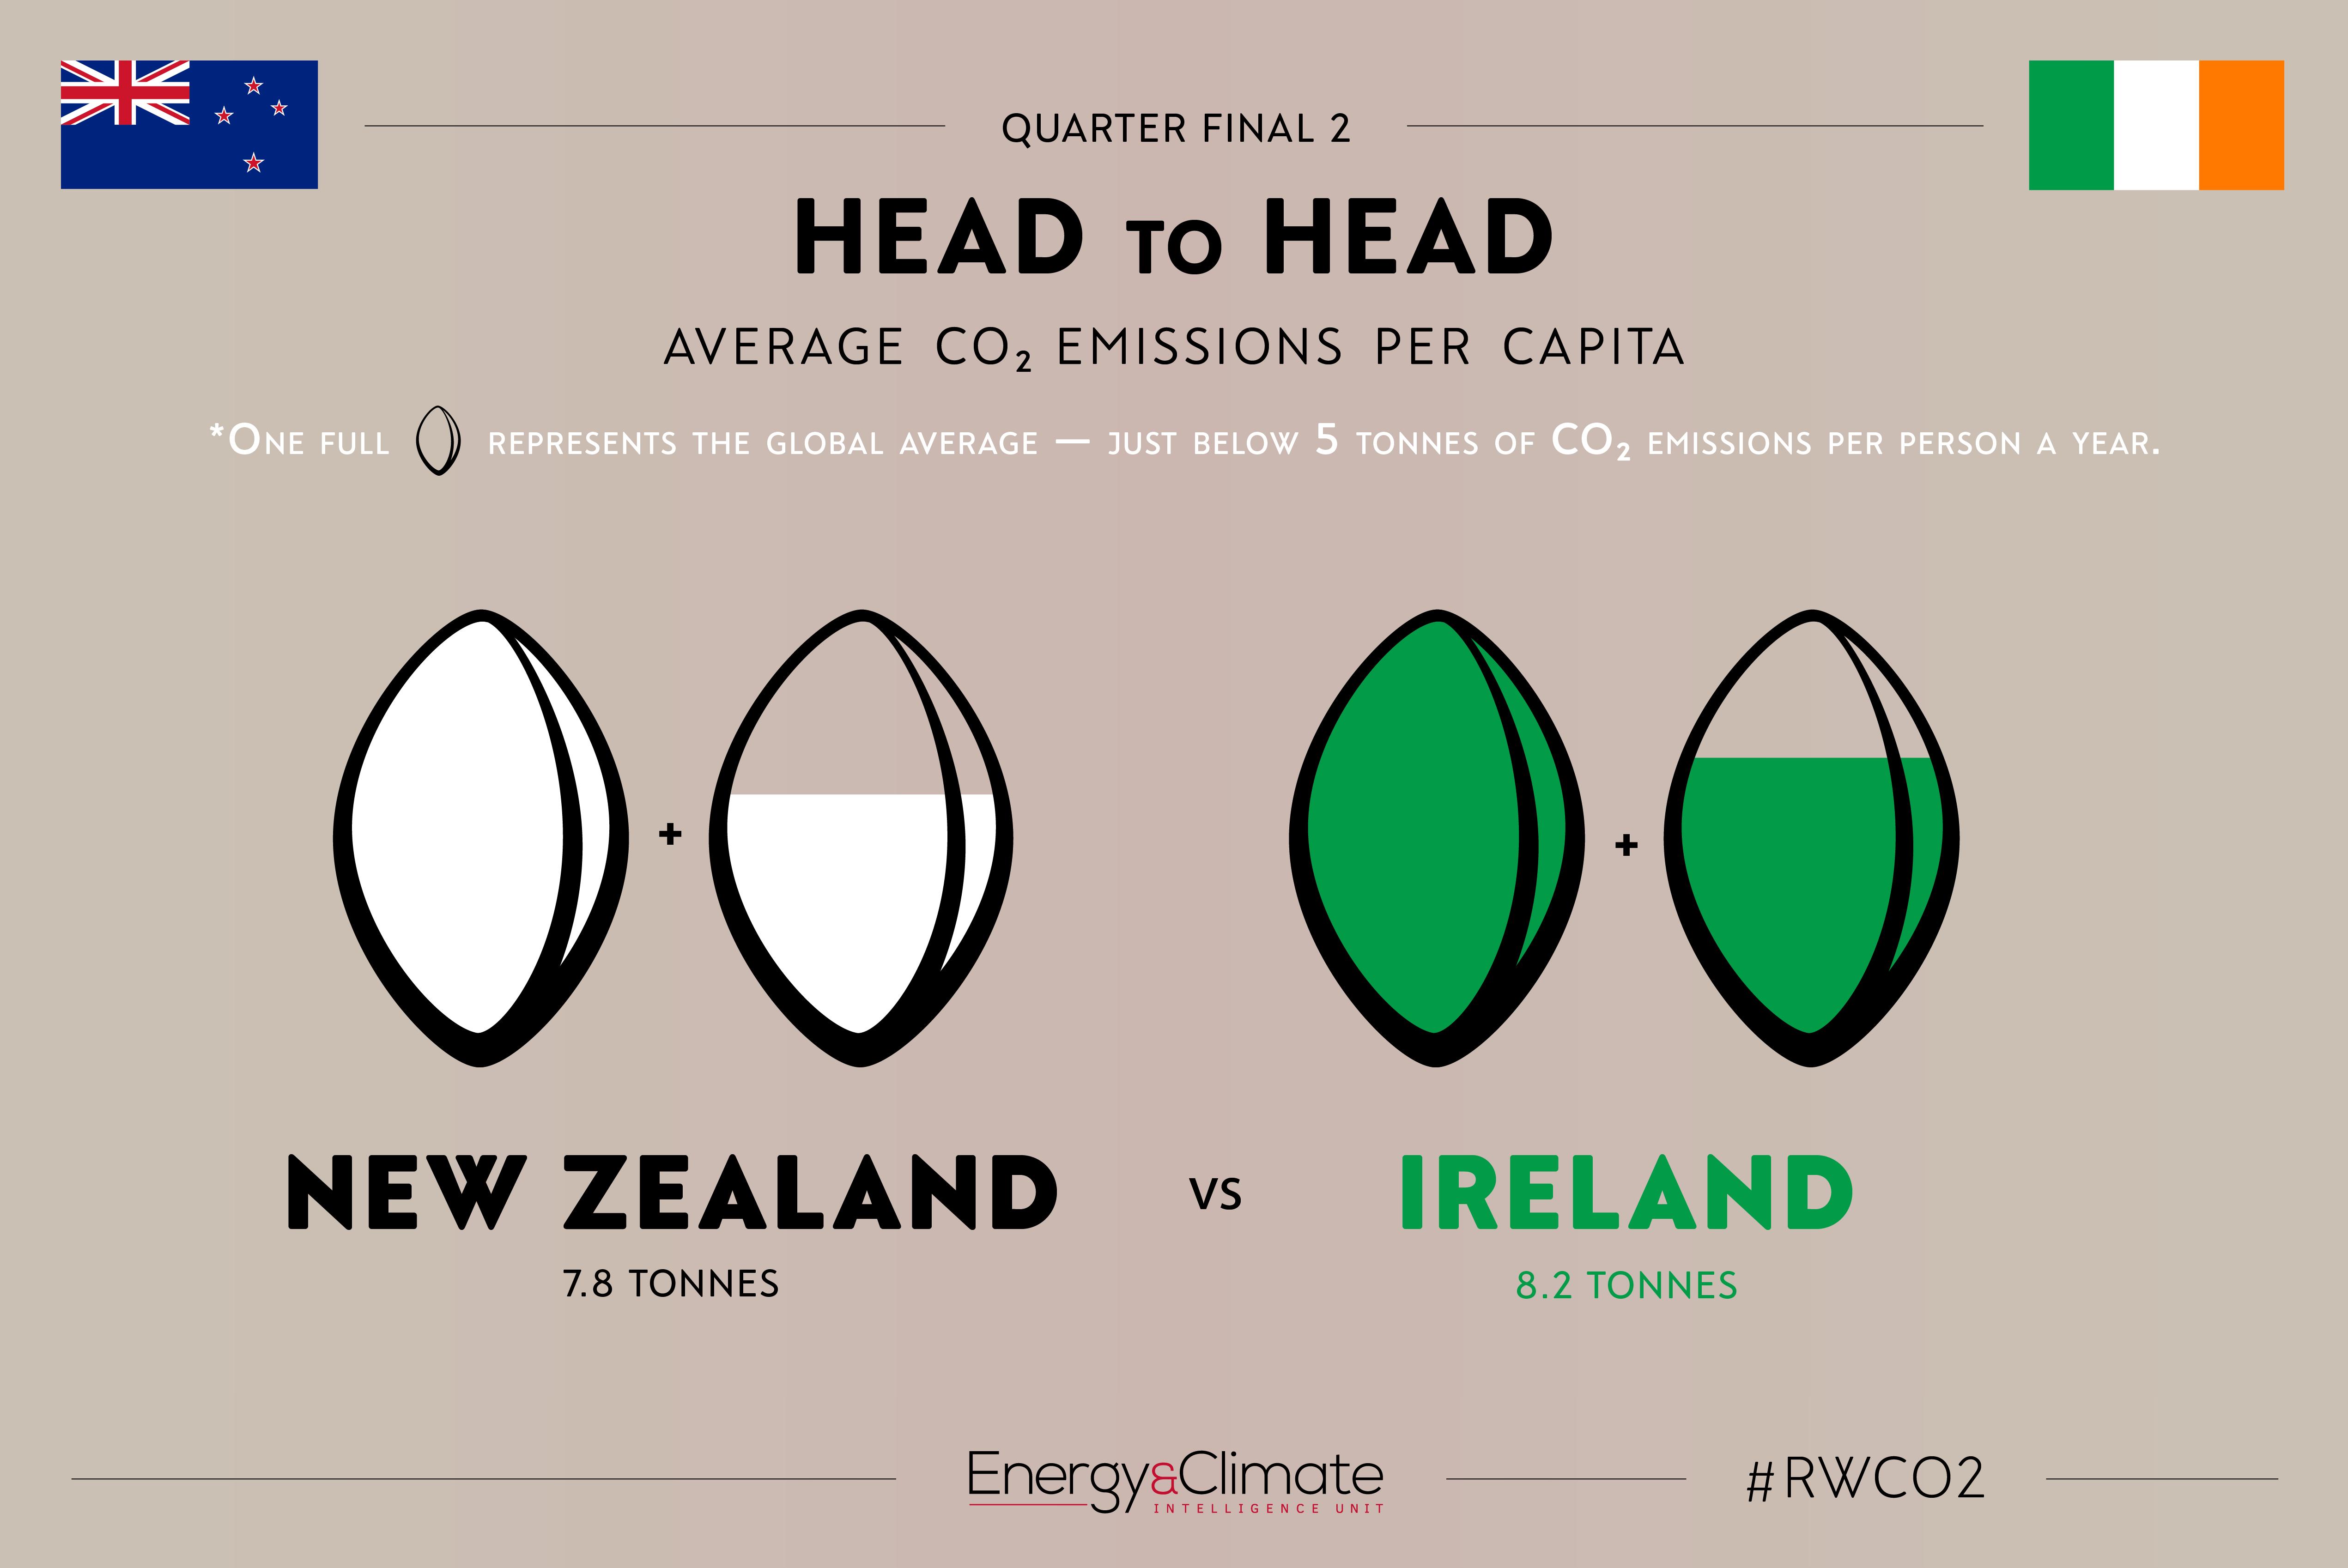 New Zeland v Ireland - per capita emissions